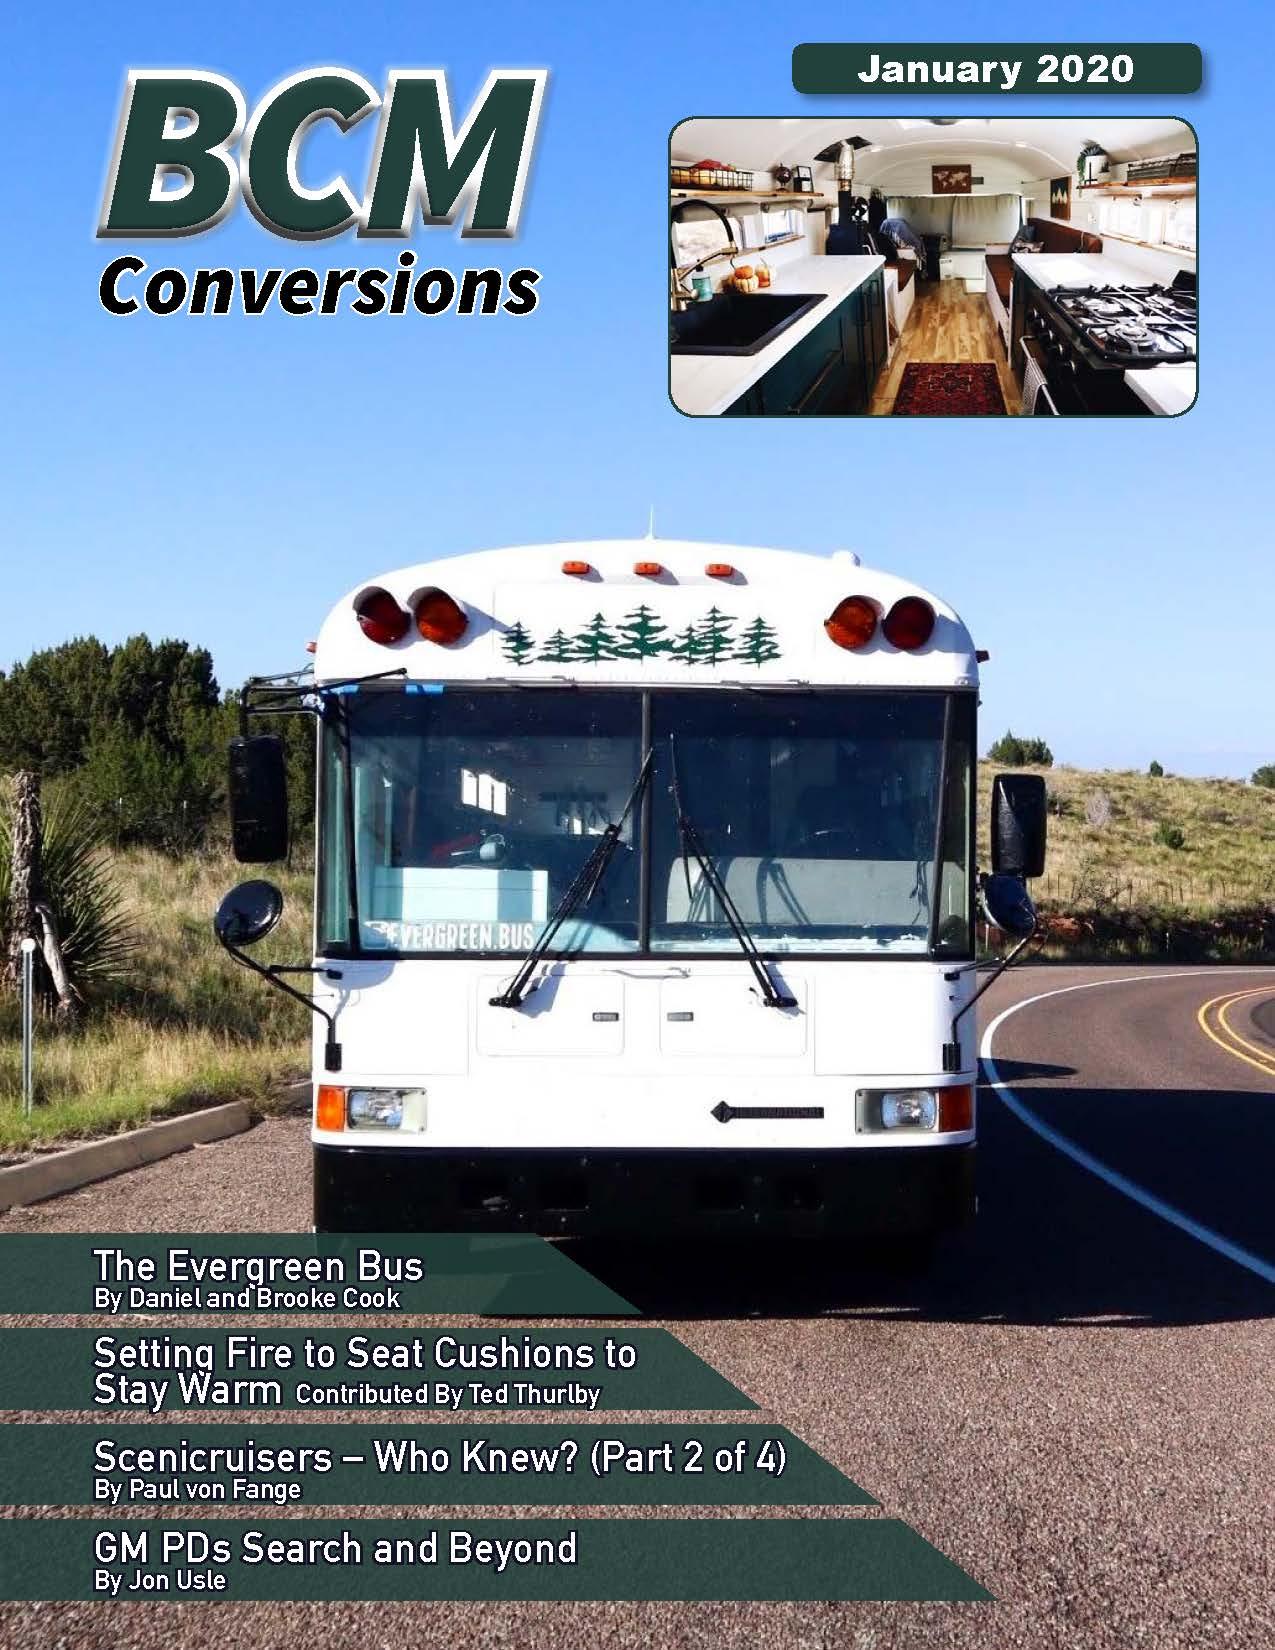 "<a href=""""><img class=""spu-open-10240"" src=""https://www.busconversionmagazine.com/wp-content/uploads/2019/12/January-Issue-2020-SD-28579-Toc.jpg""/></a>"